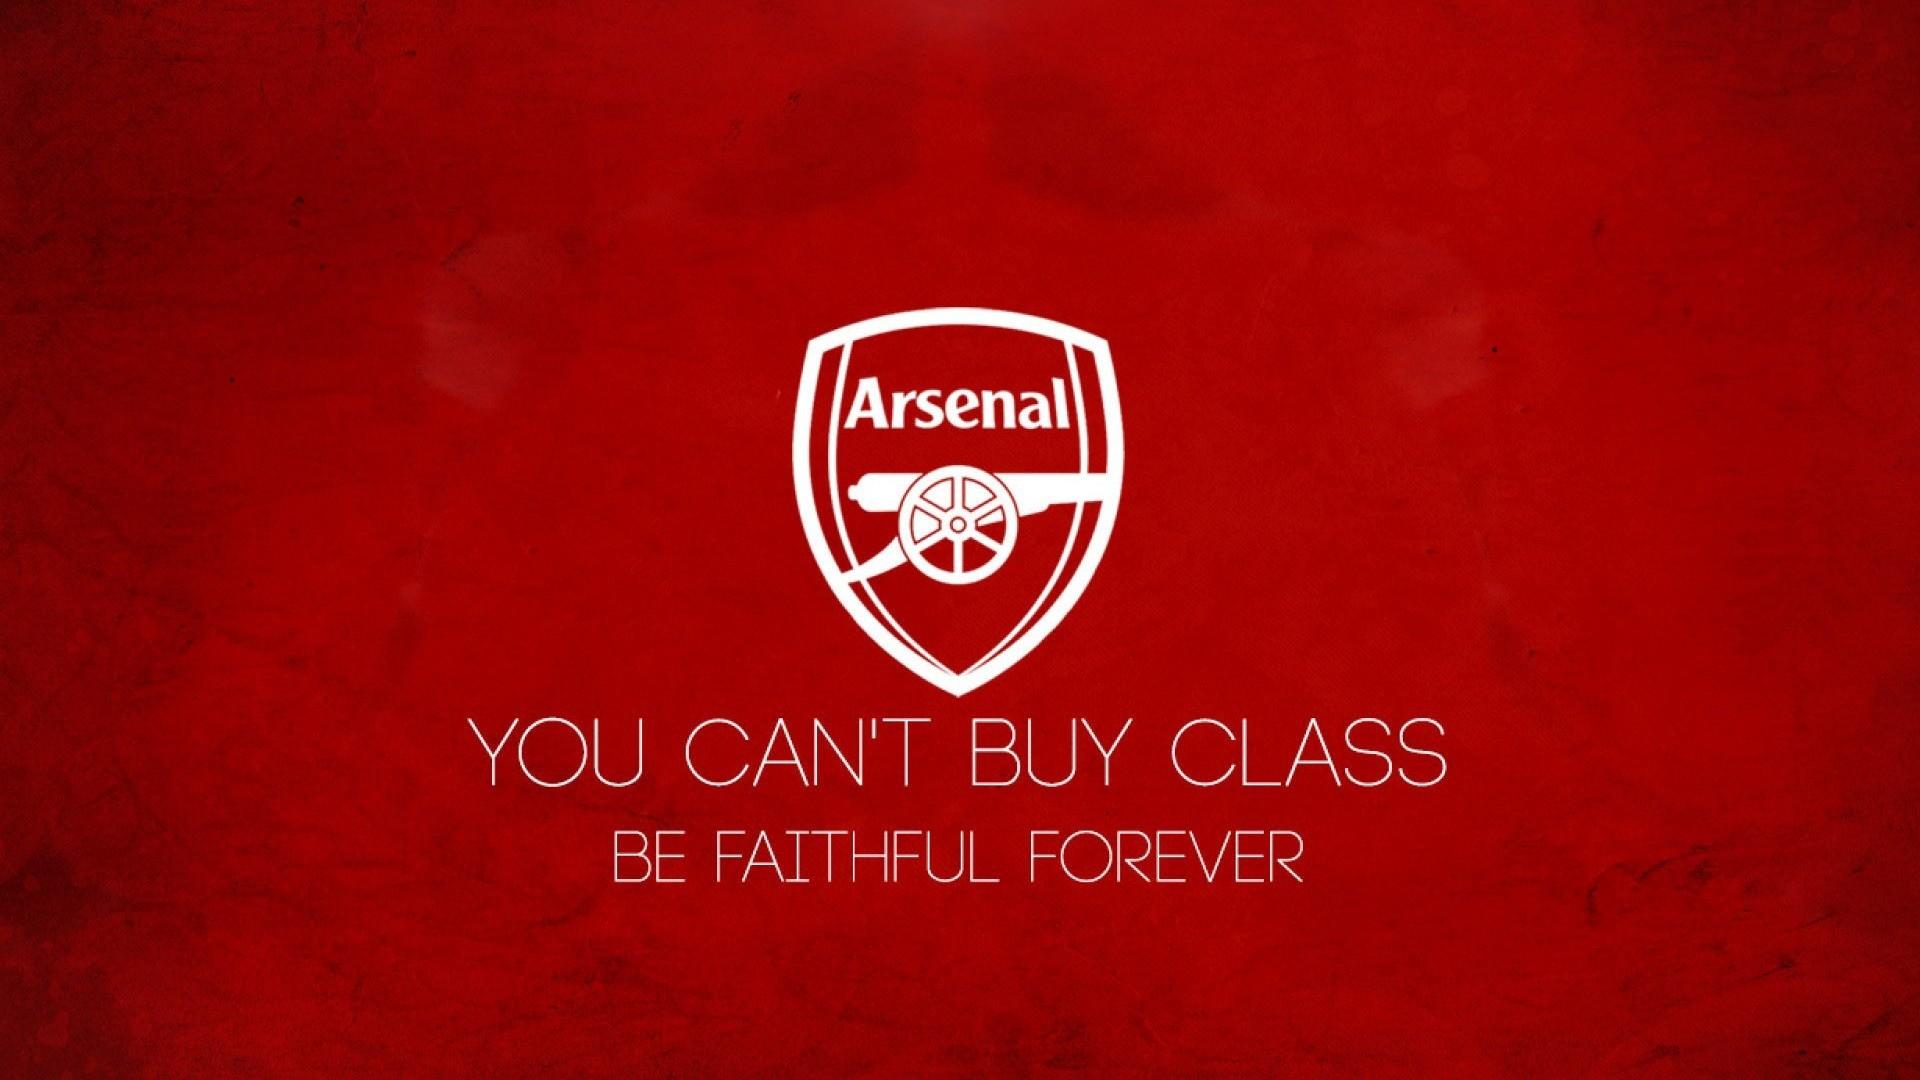 arsenal football club hd wallpapers